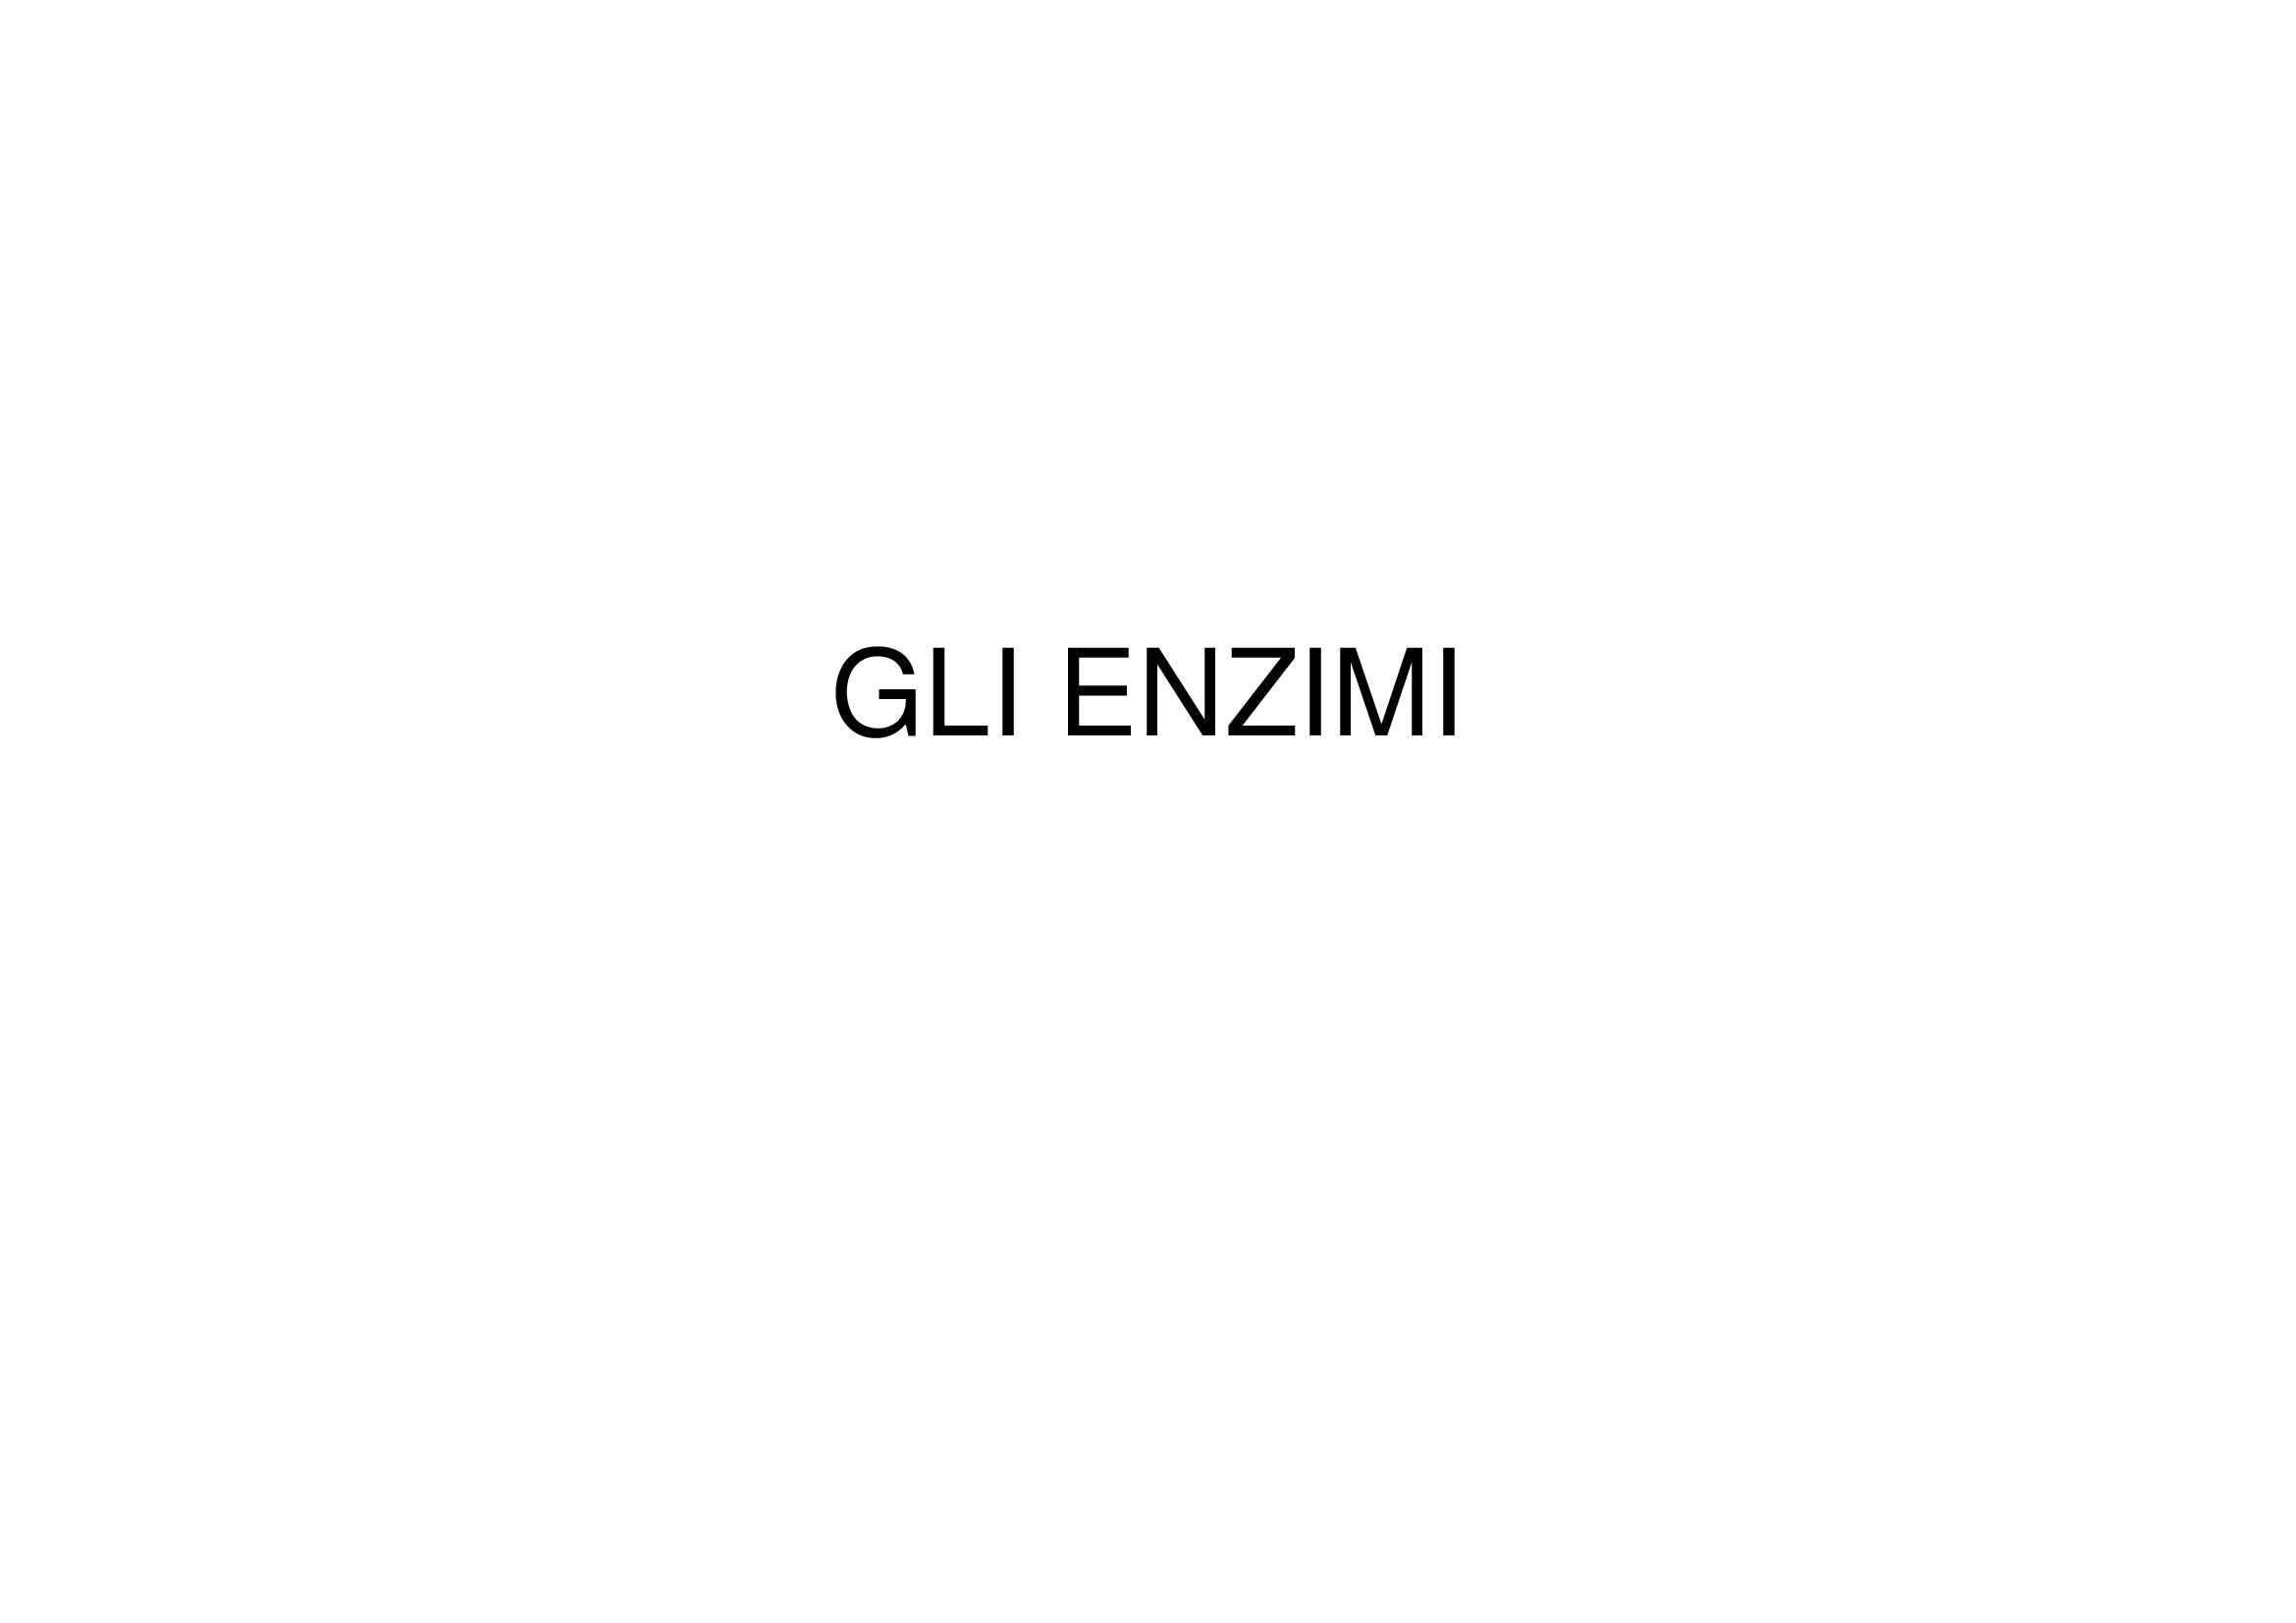 Enzimi